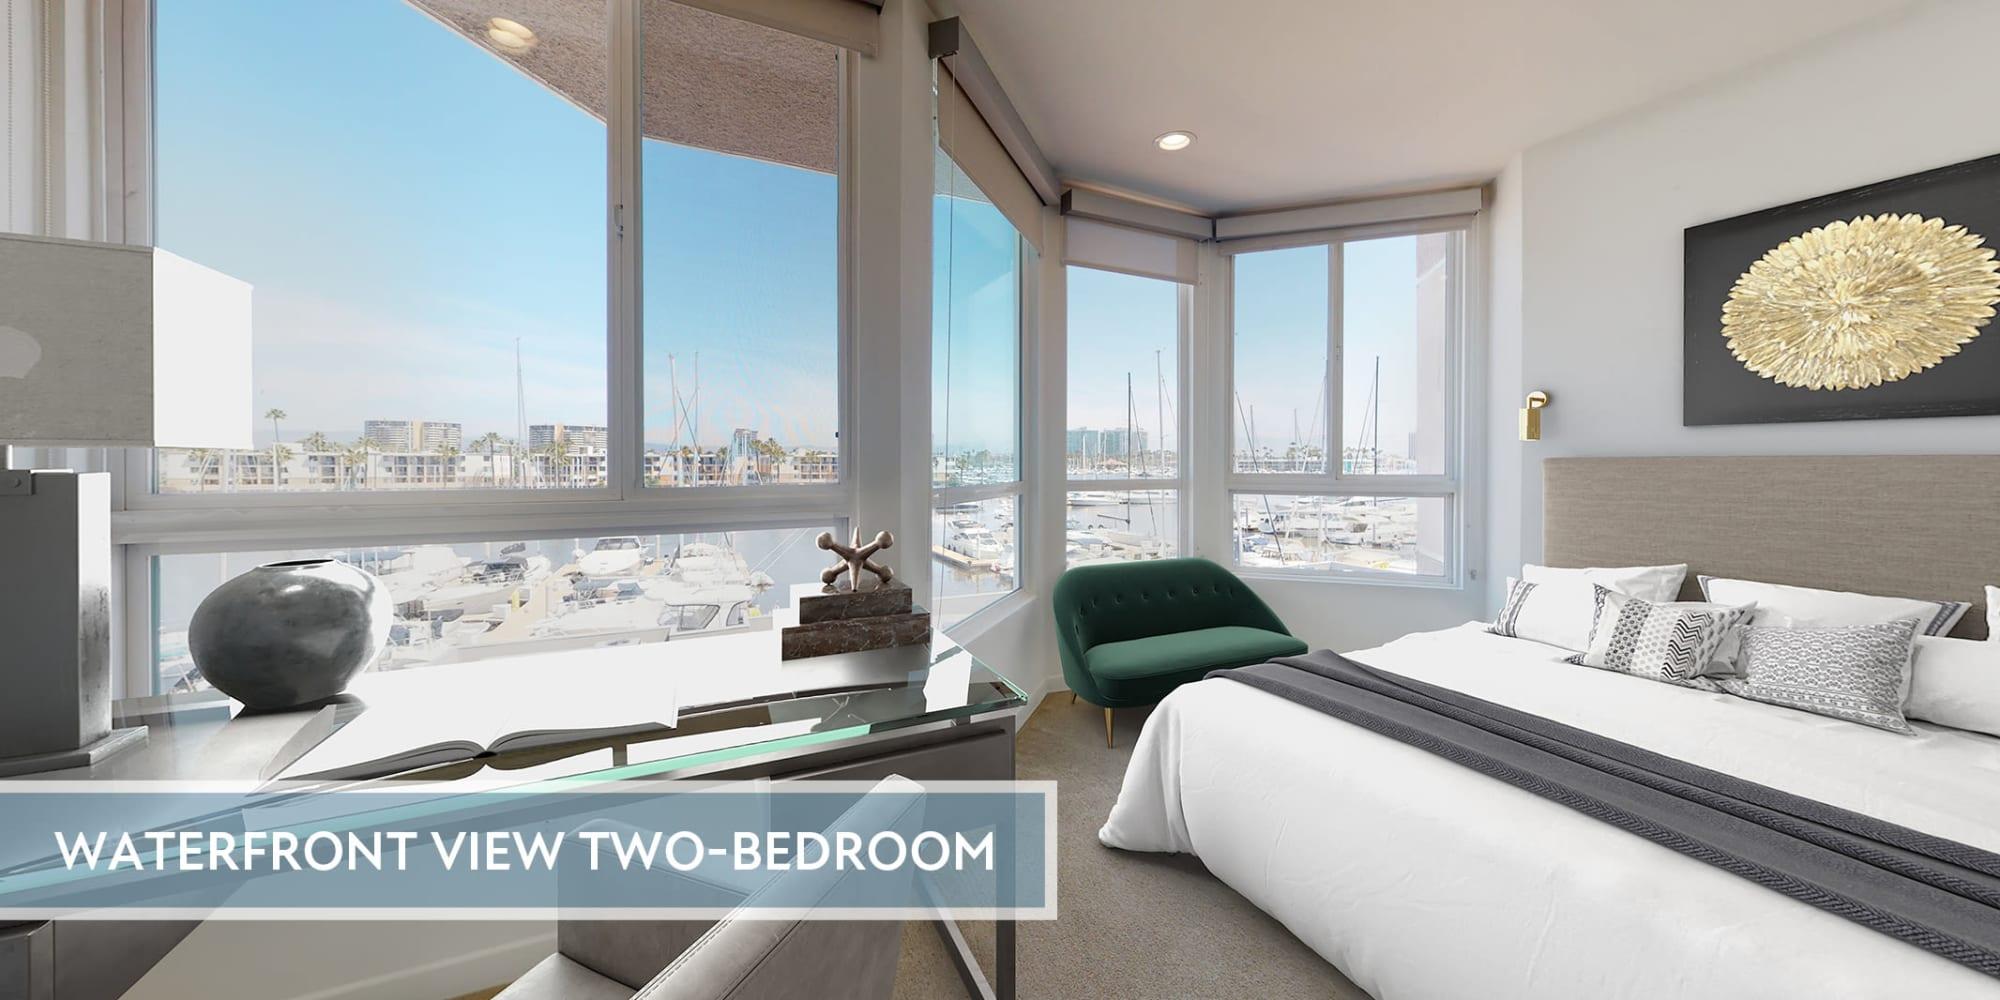 Bedroom with expansive views of the marina at Esprit Marina del Rey in Marina del Rey, California